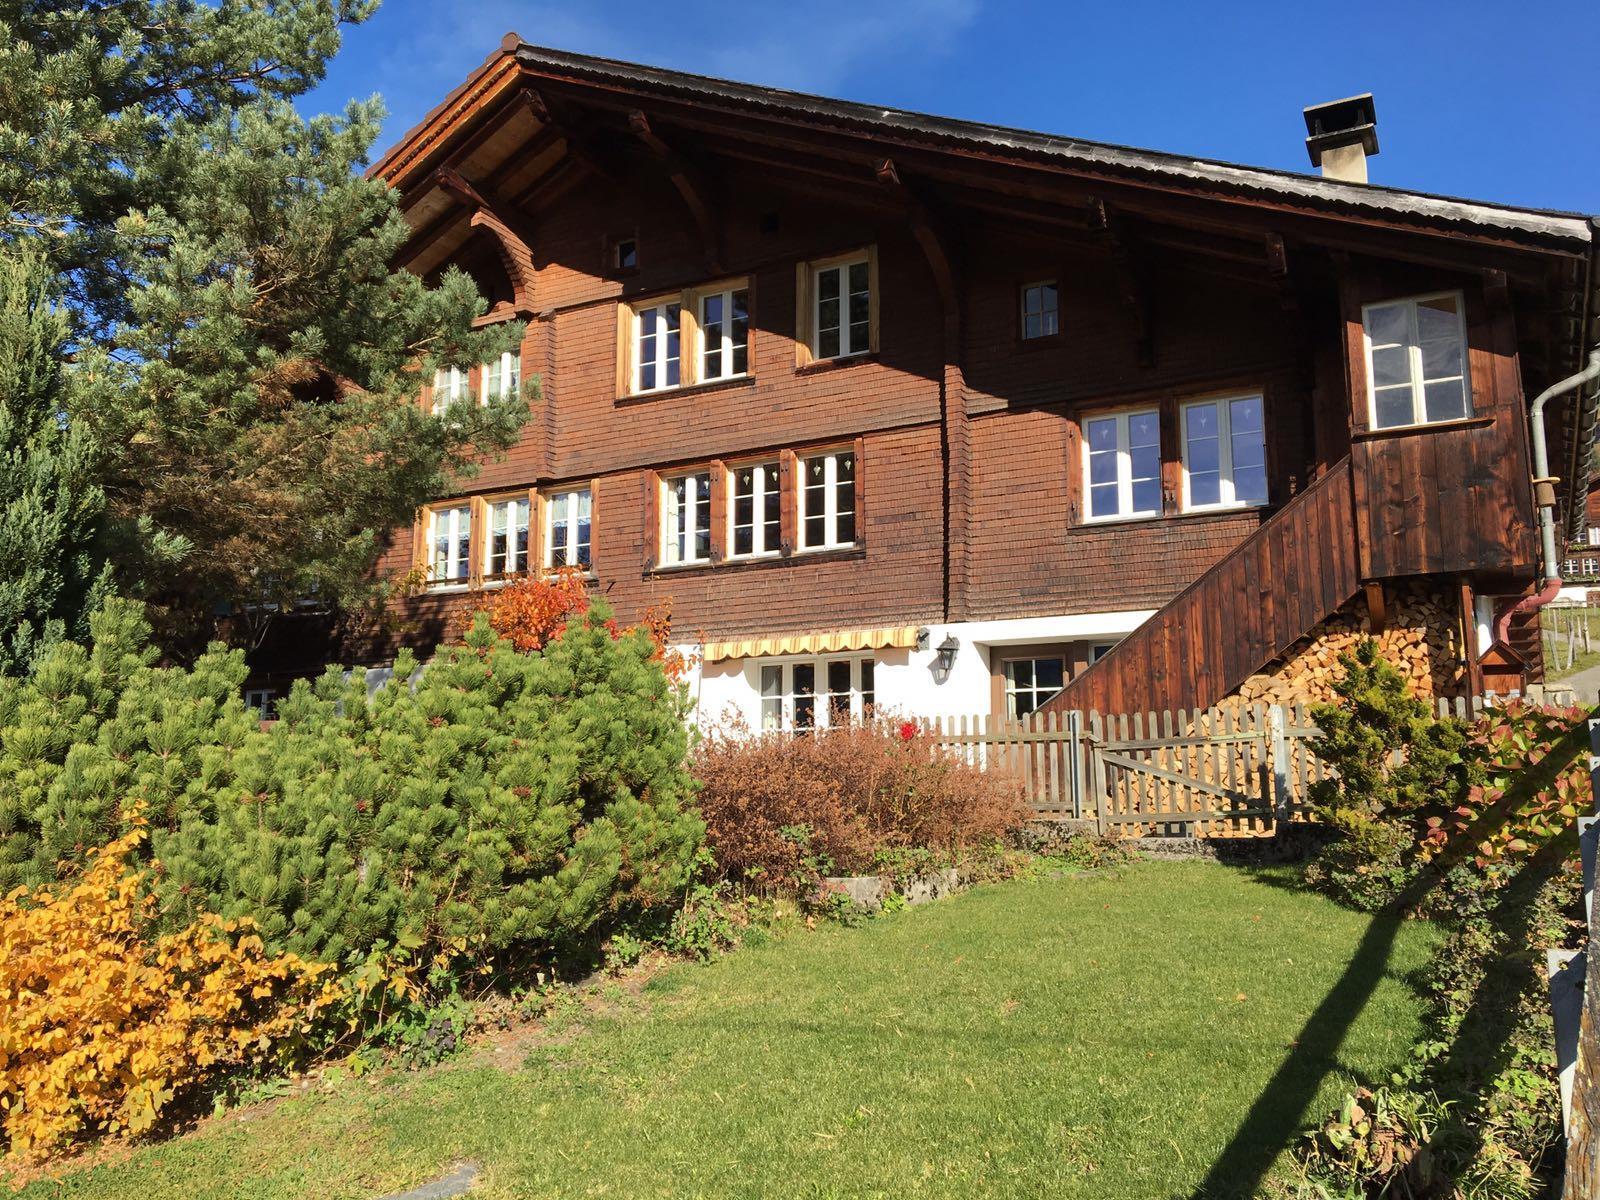 Ferienwohnung Am Gässli 5-Bettwohnung (2691691), Hasliberg Hohfluh, Meiringen - Hasliberg, Berner Oberland, Schweiz, Bild 2